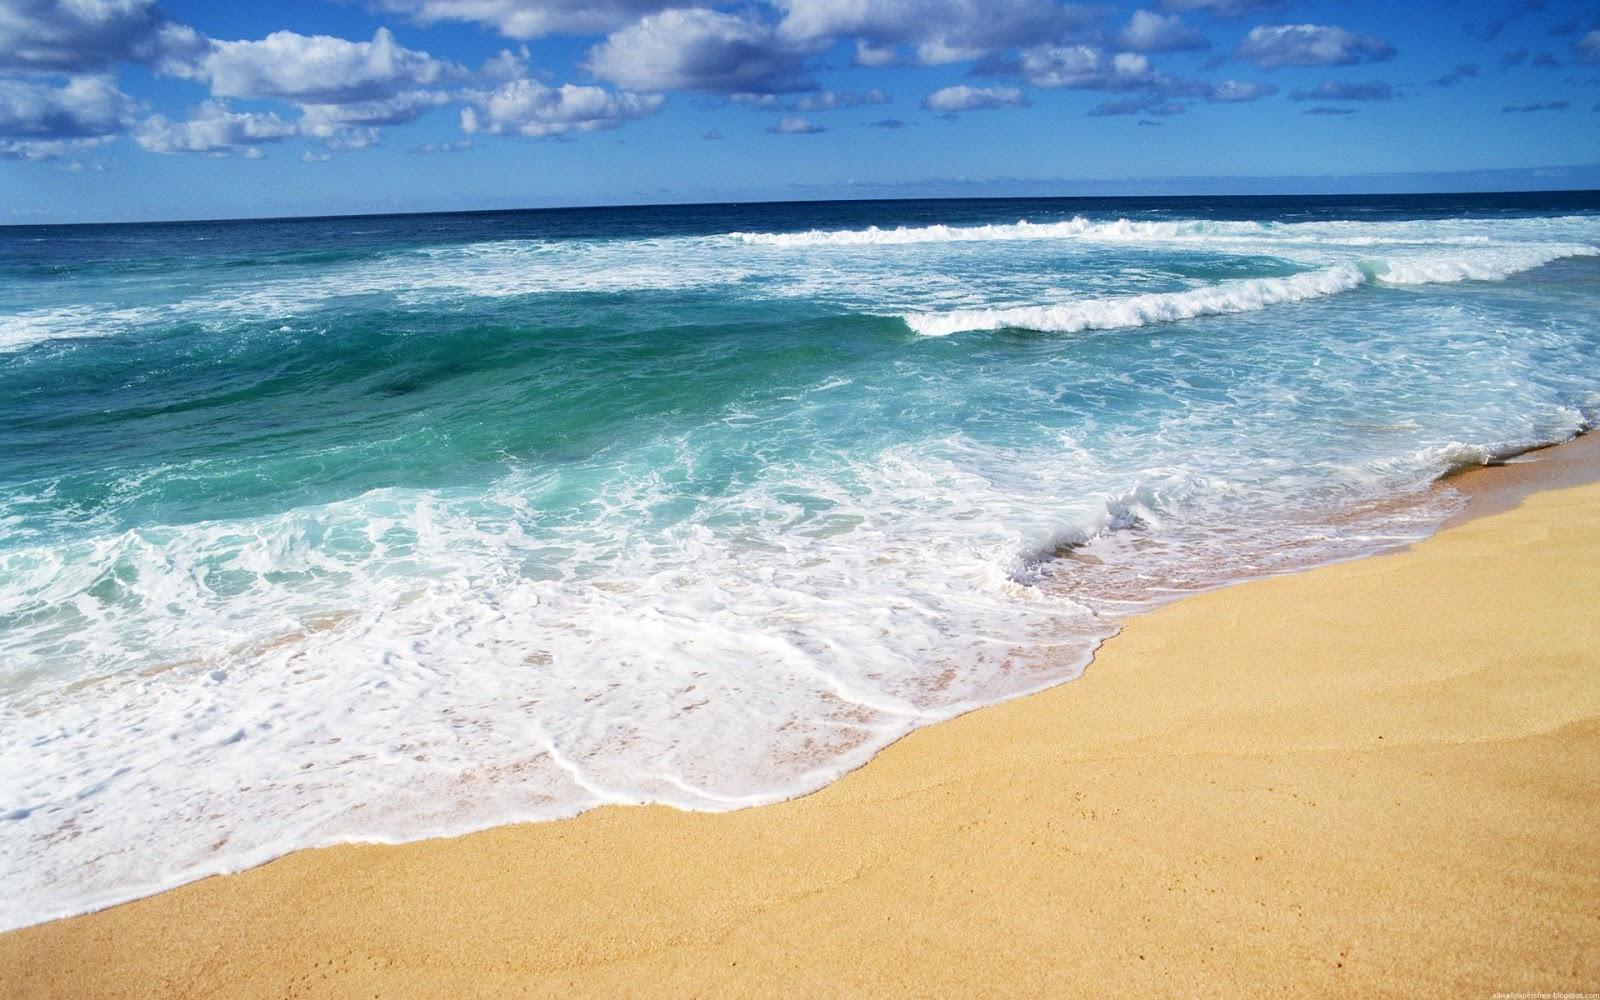 Online Wallpapers Shop: Beach Wallpaper   Beach Pictures Backgrounds   Free Beach Desktop Images